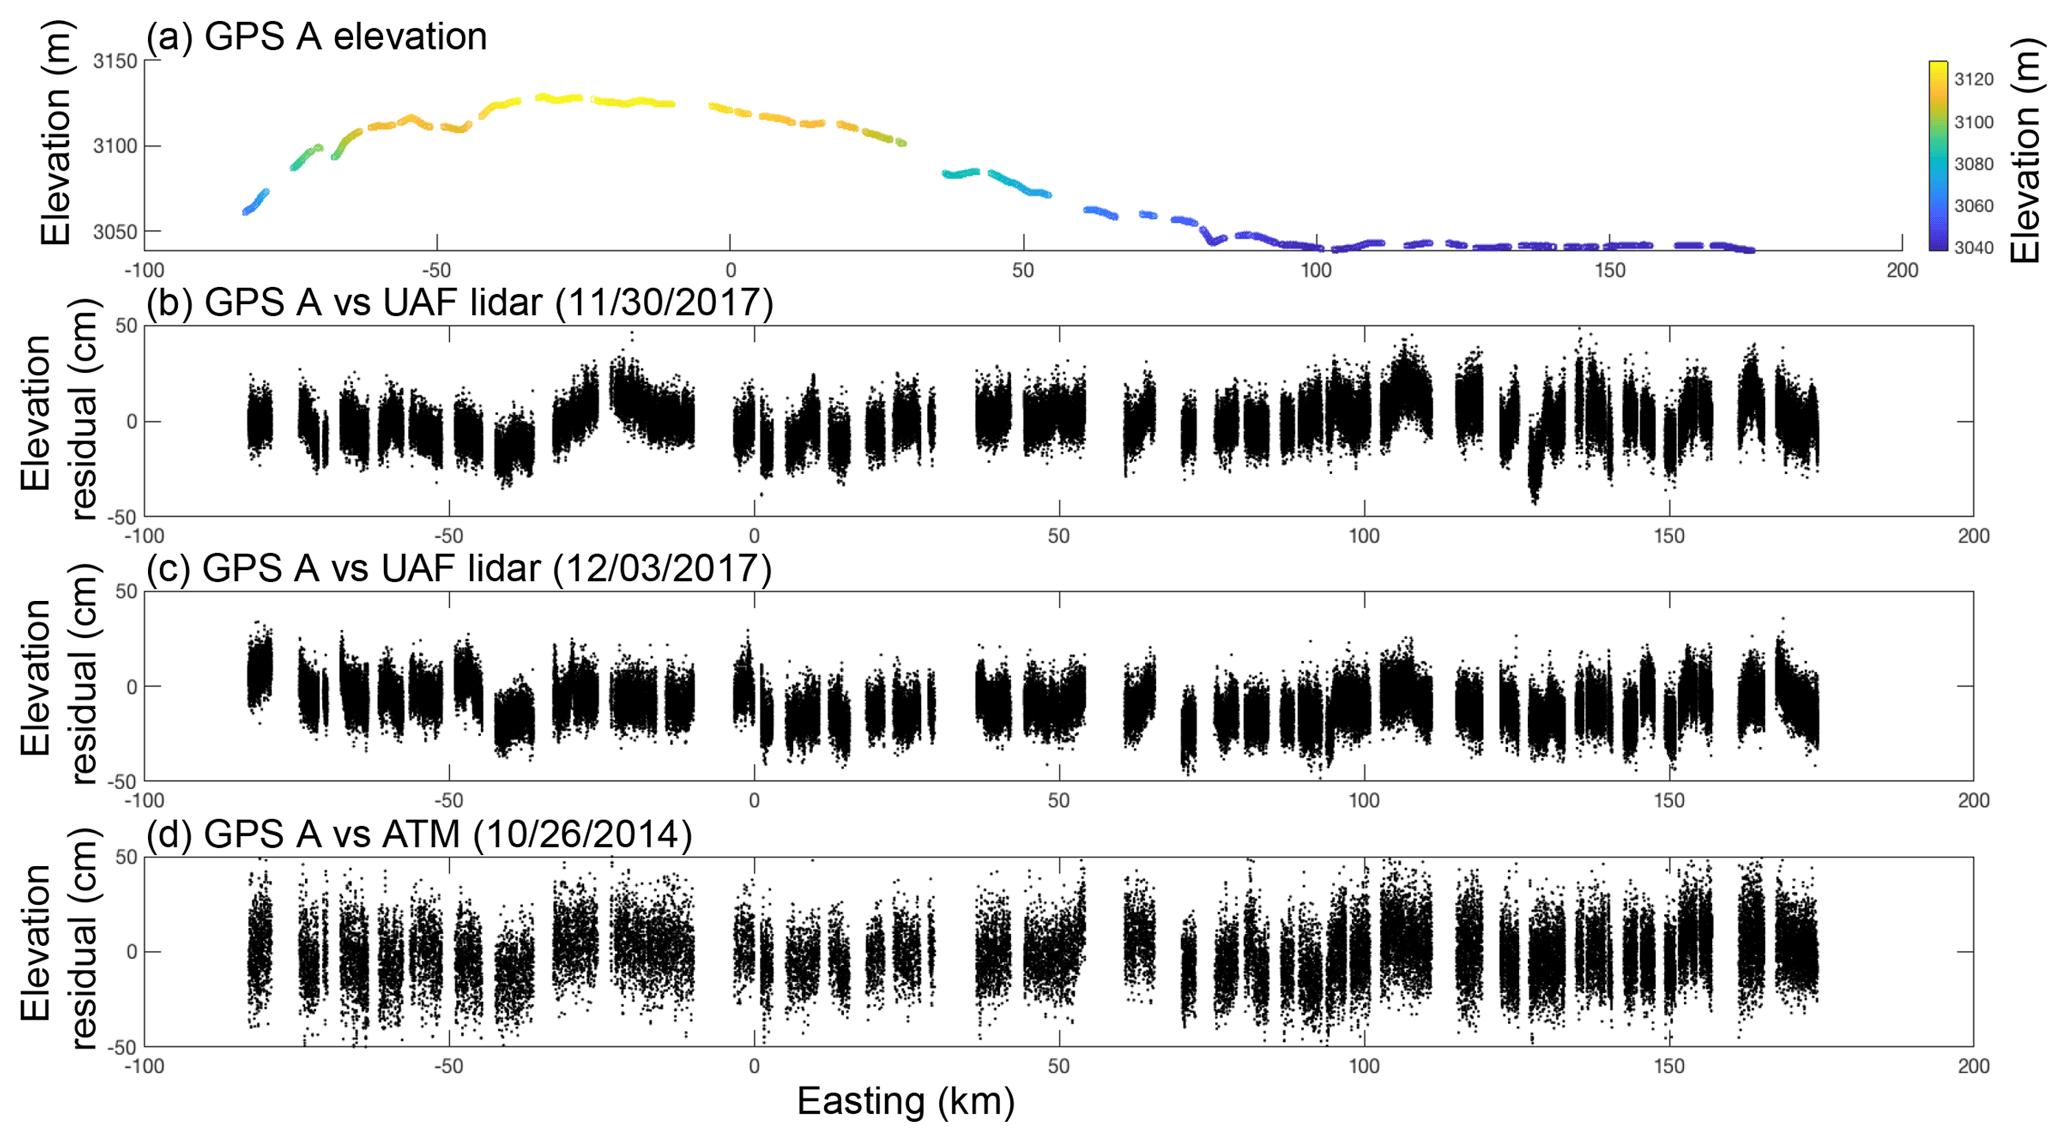 TC - Assessment of altimetry using ground-based GPS data